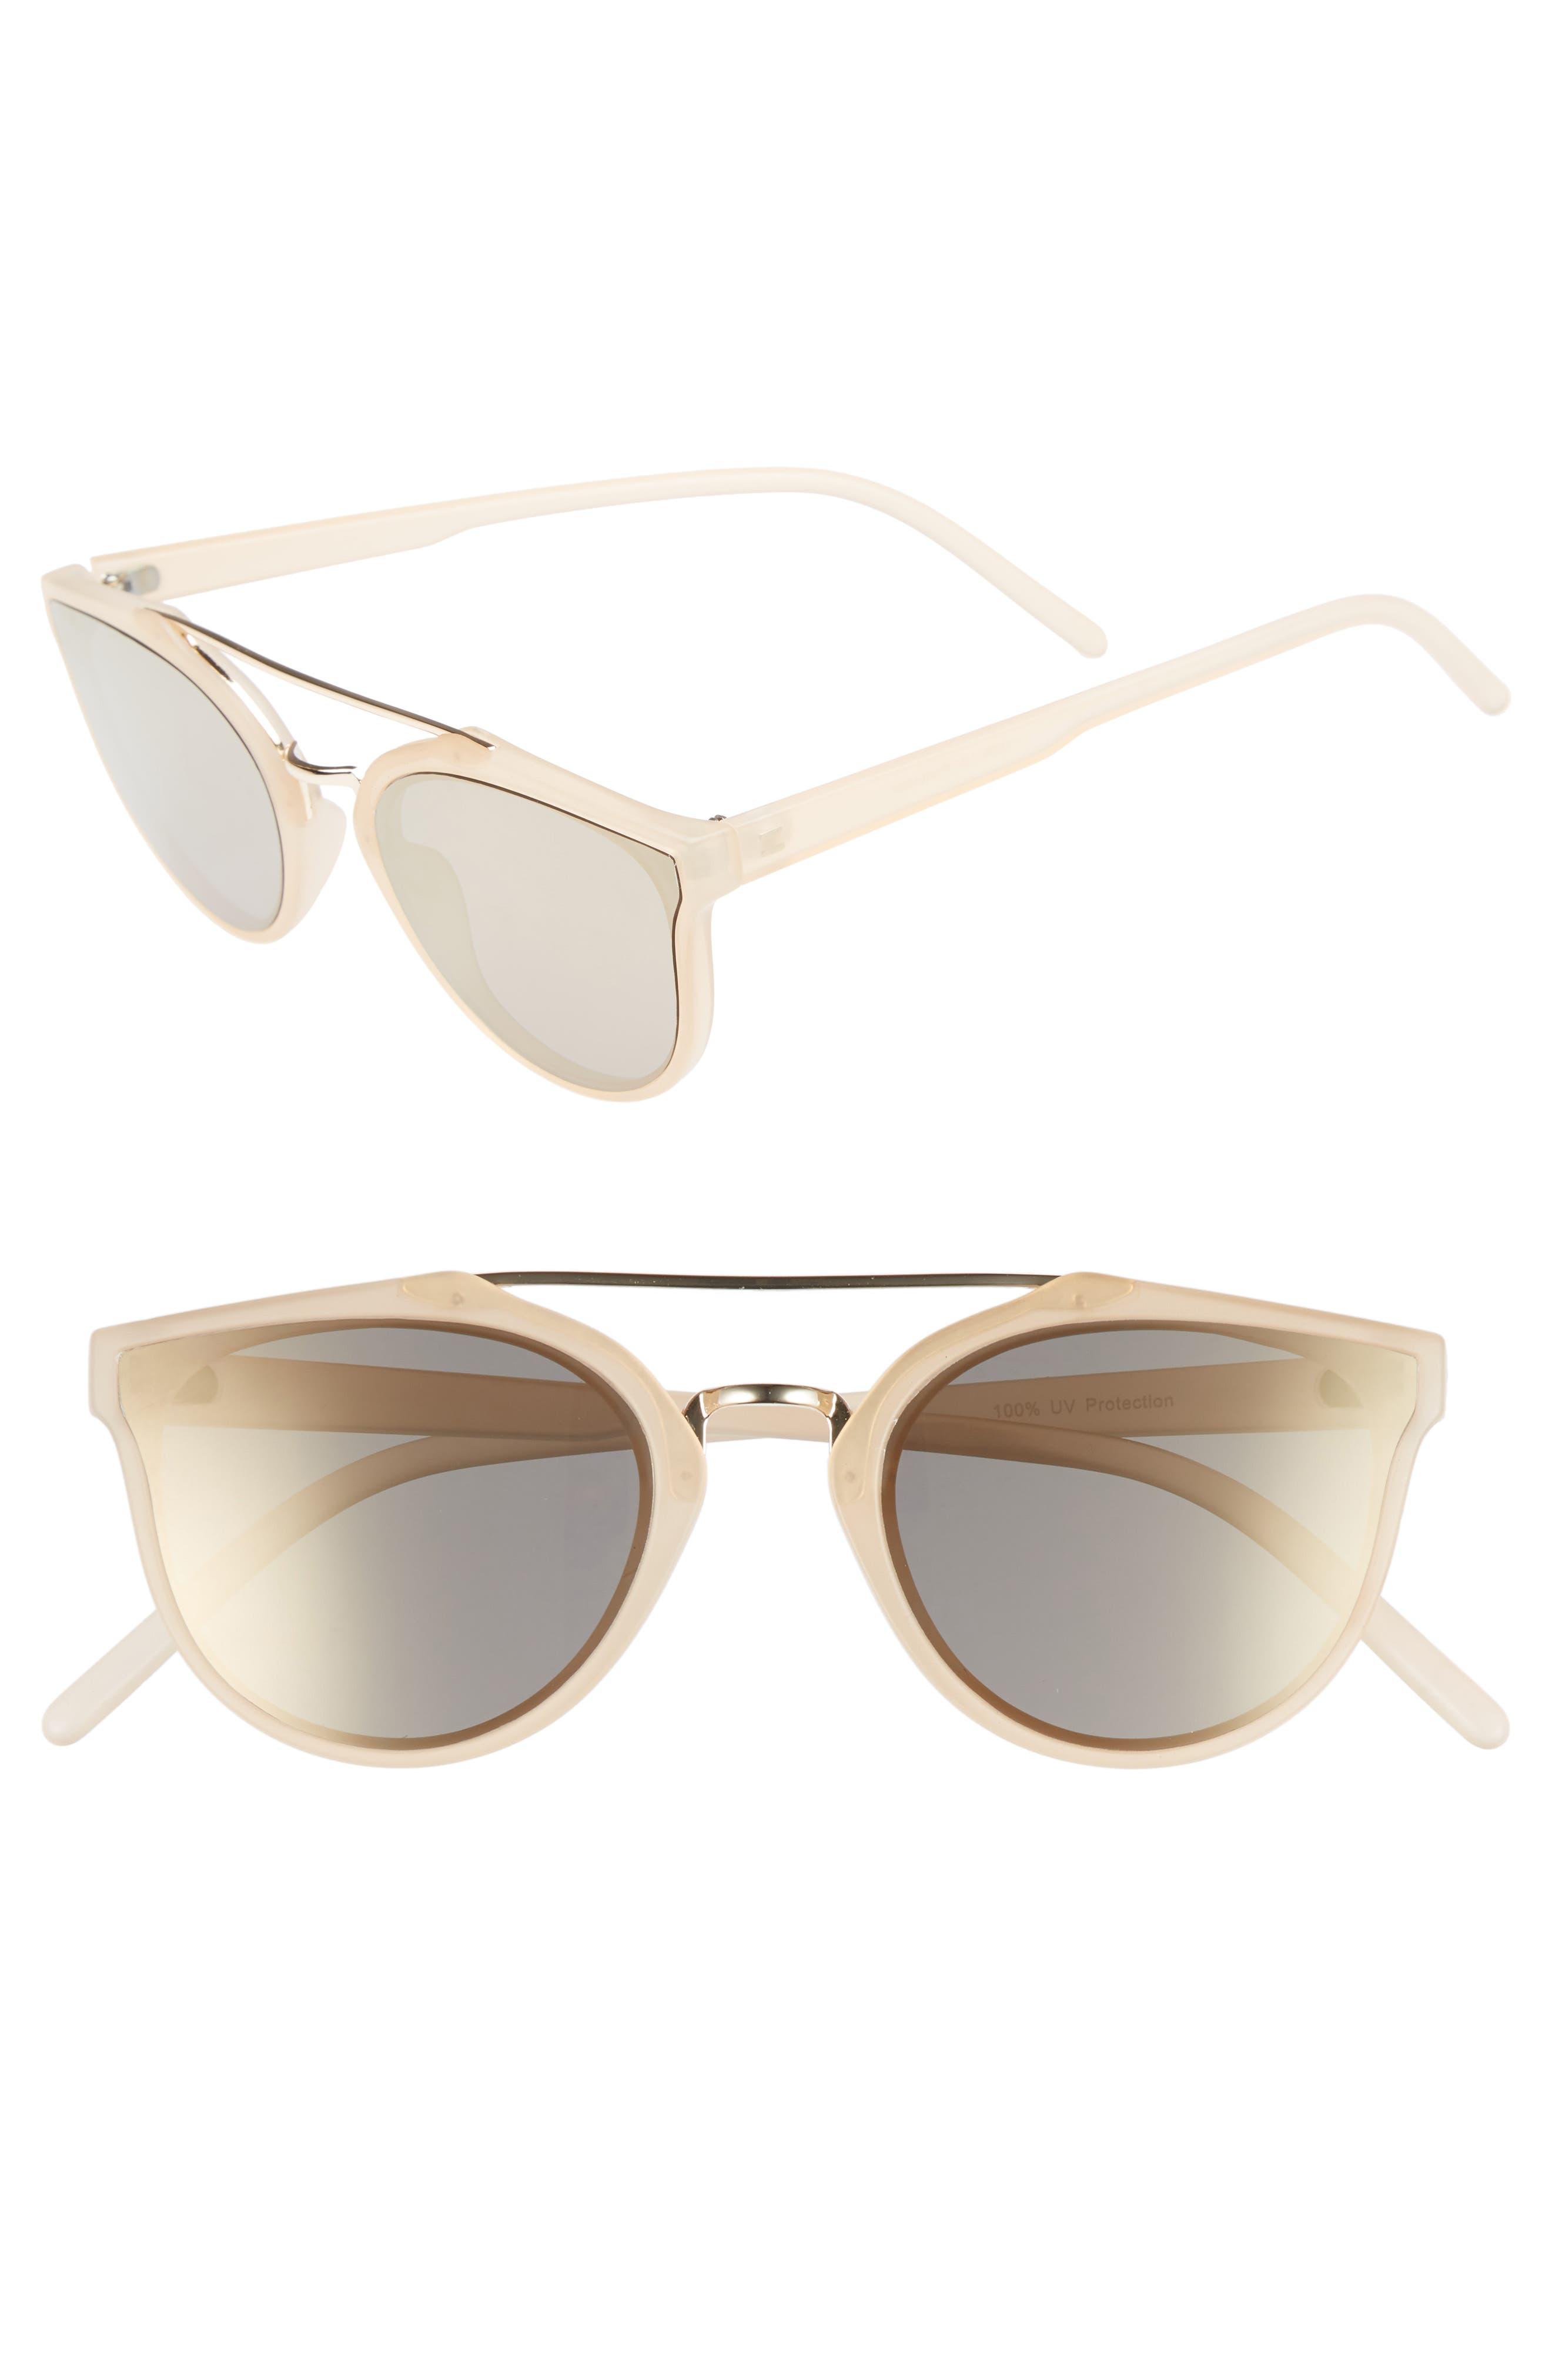 Aviator Sunglasses,                             Main thumbnail 1, color,                             Milky Peach/ Gold